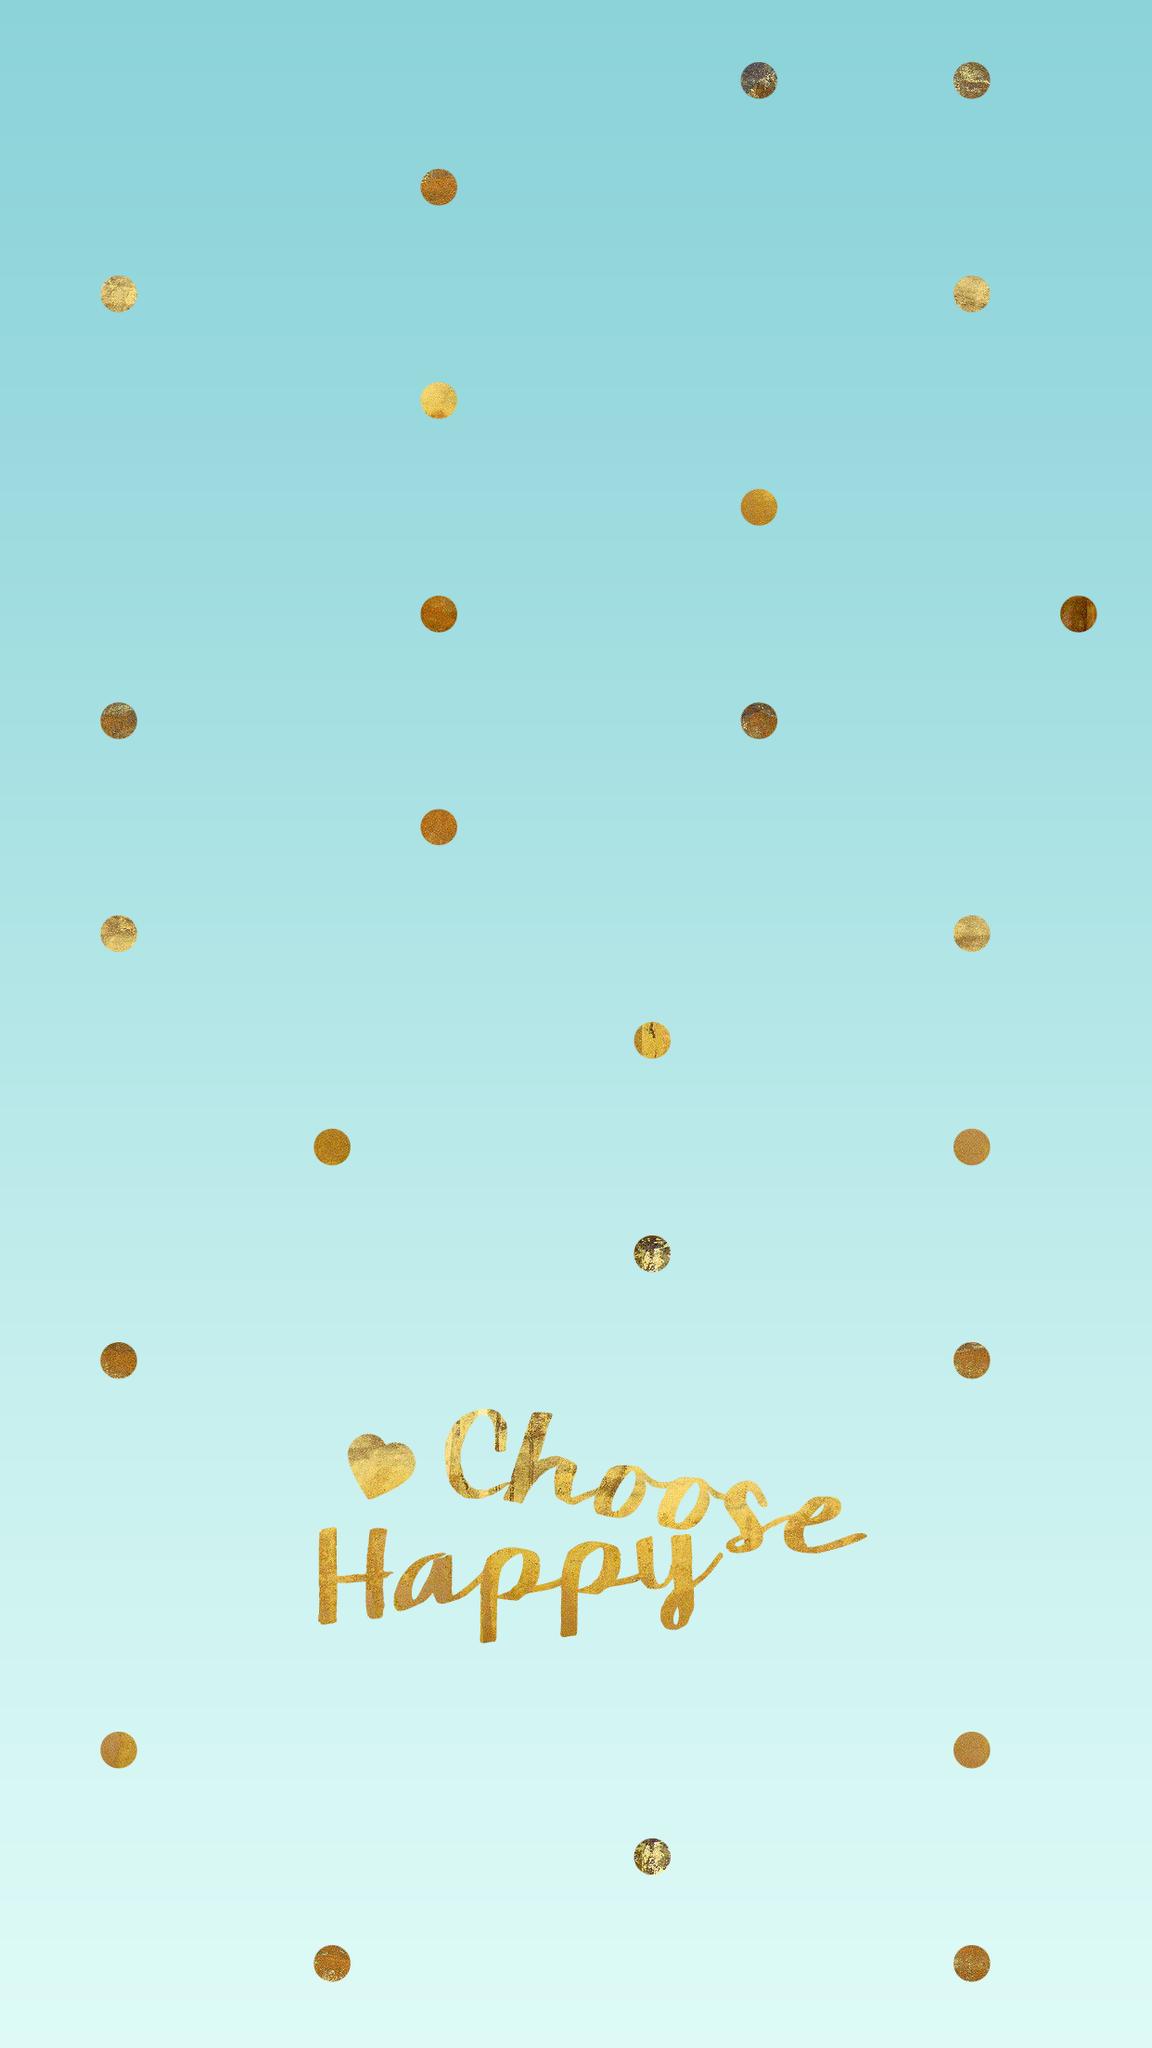 Dropbox Lou Becca B Wallbox Happy wallpaper, Cellphone